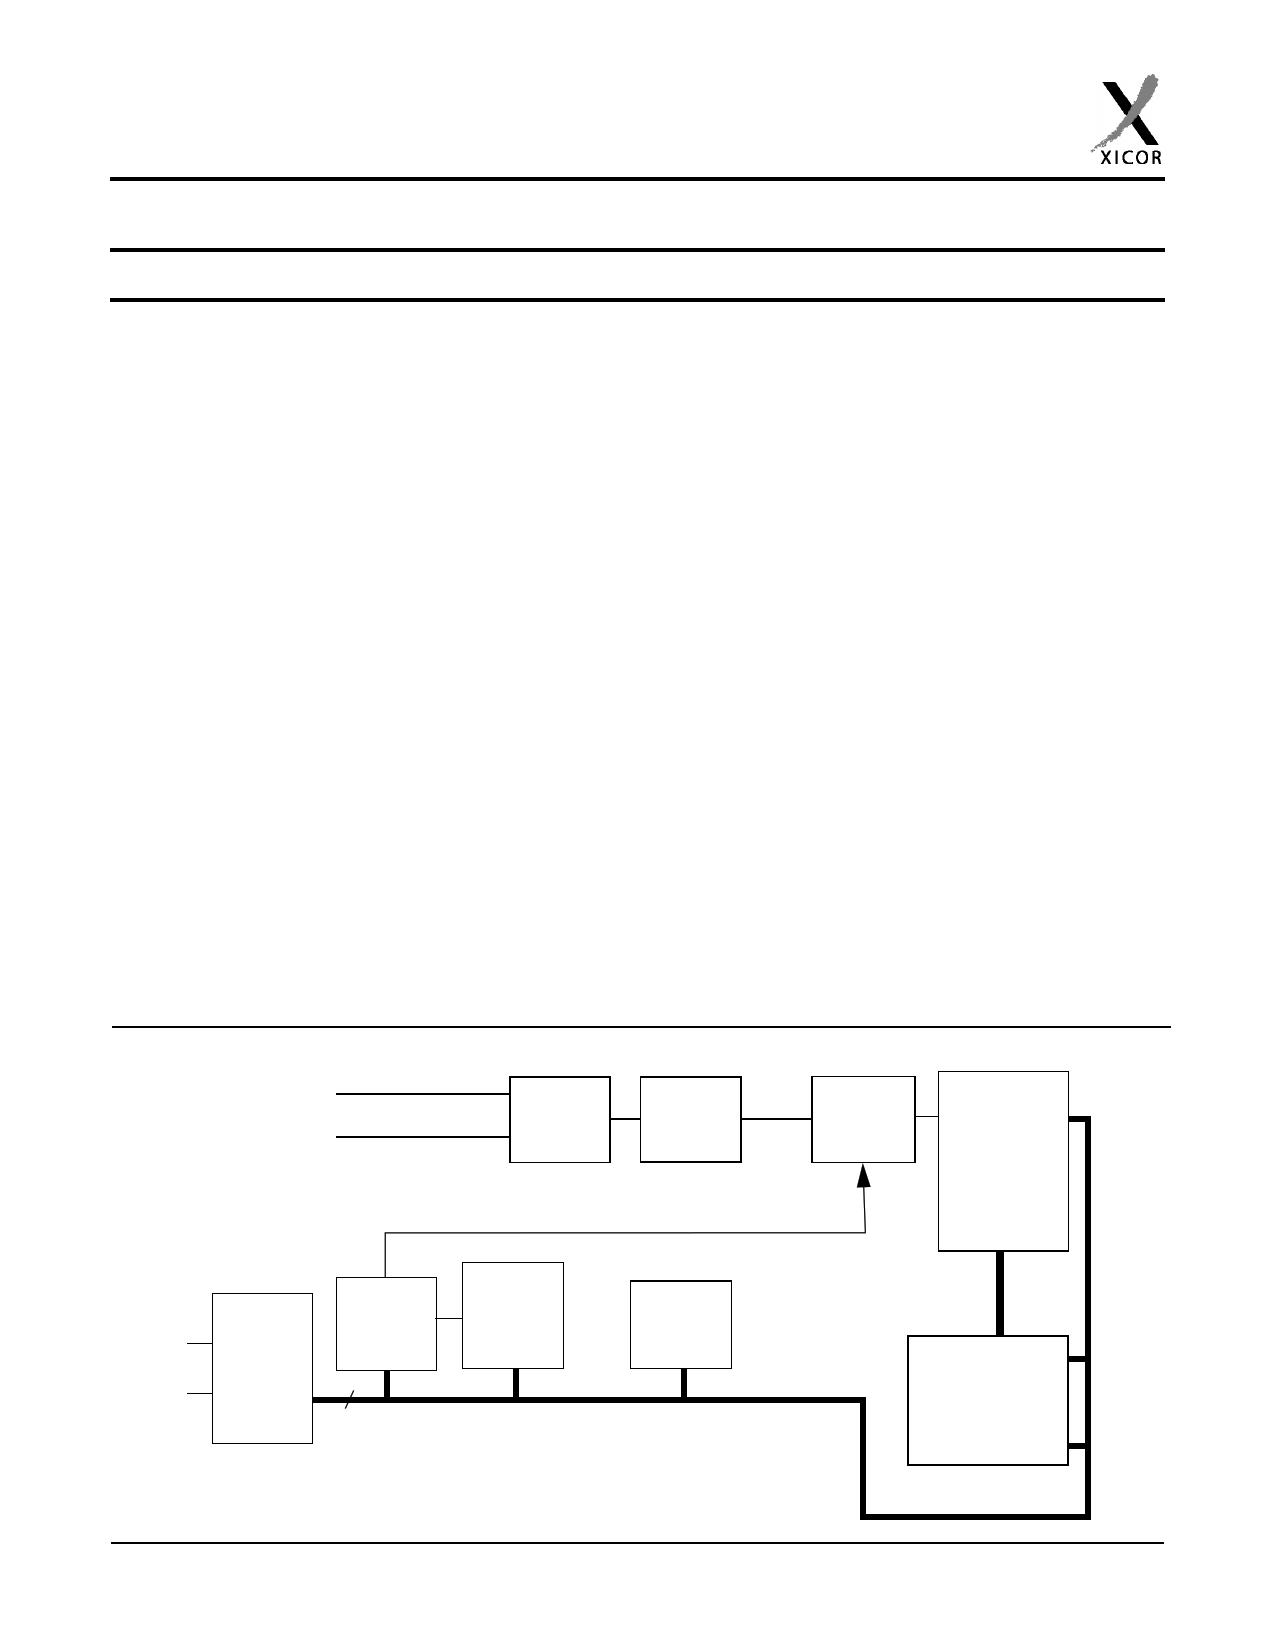 X1240V8I datasheet